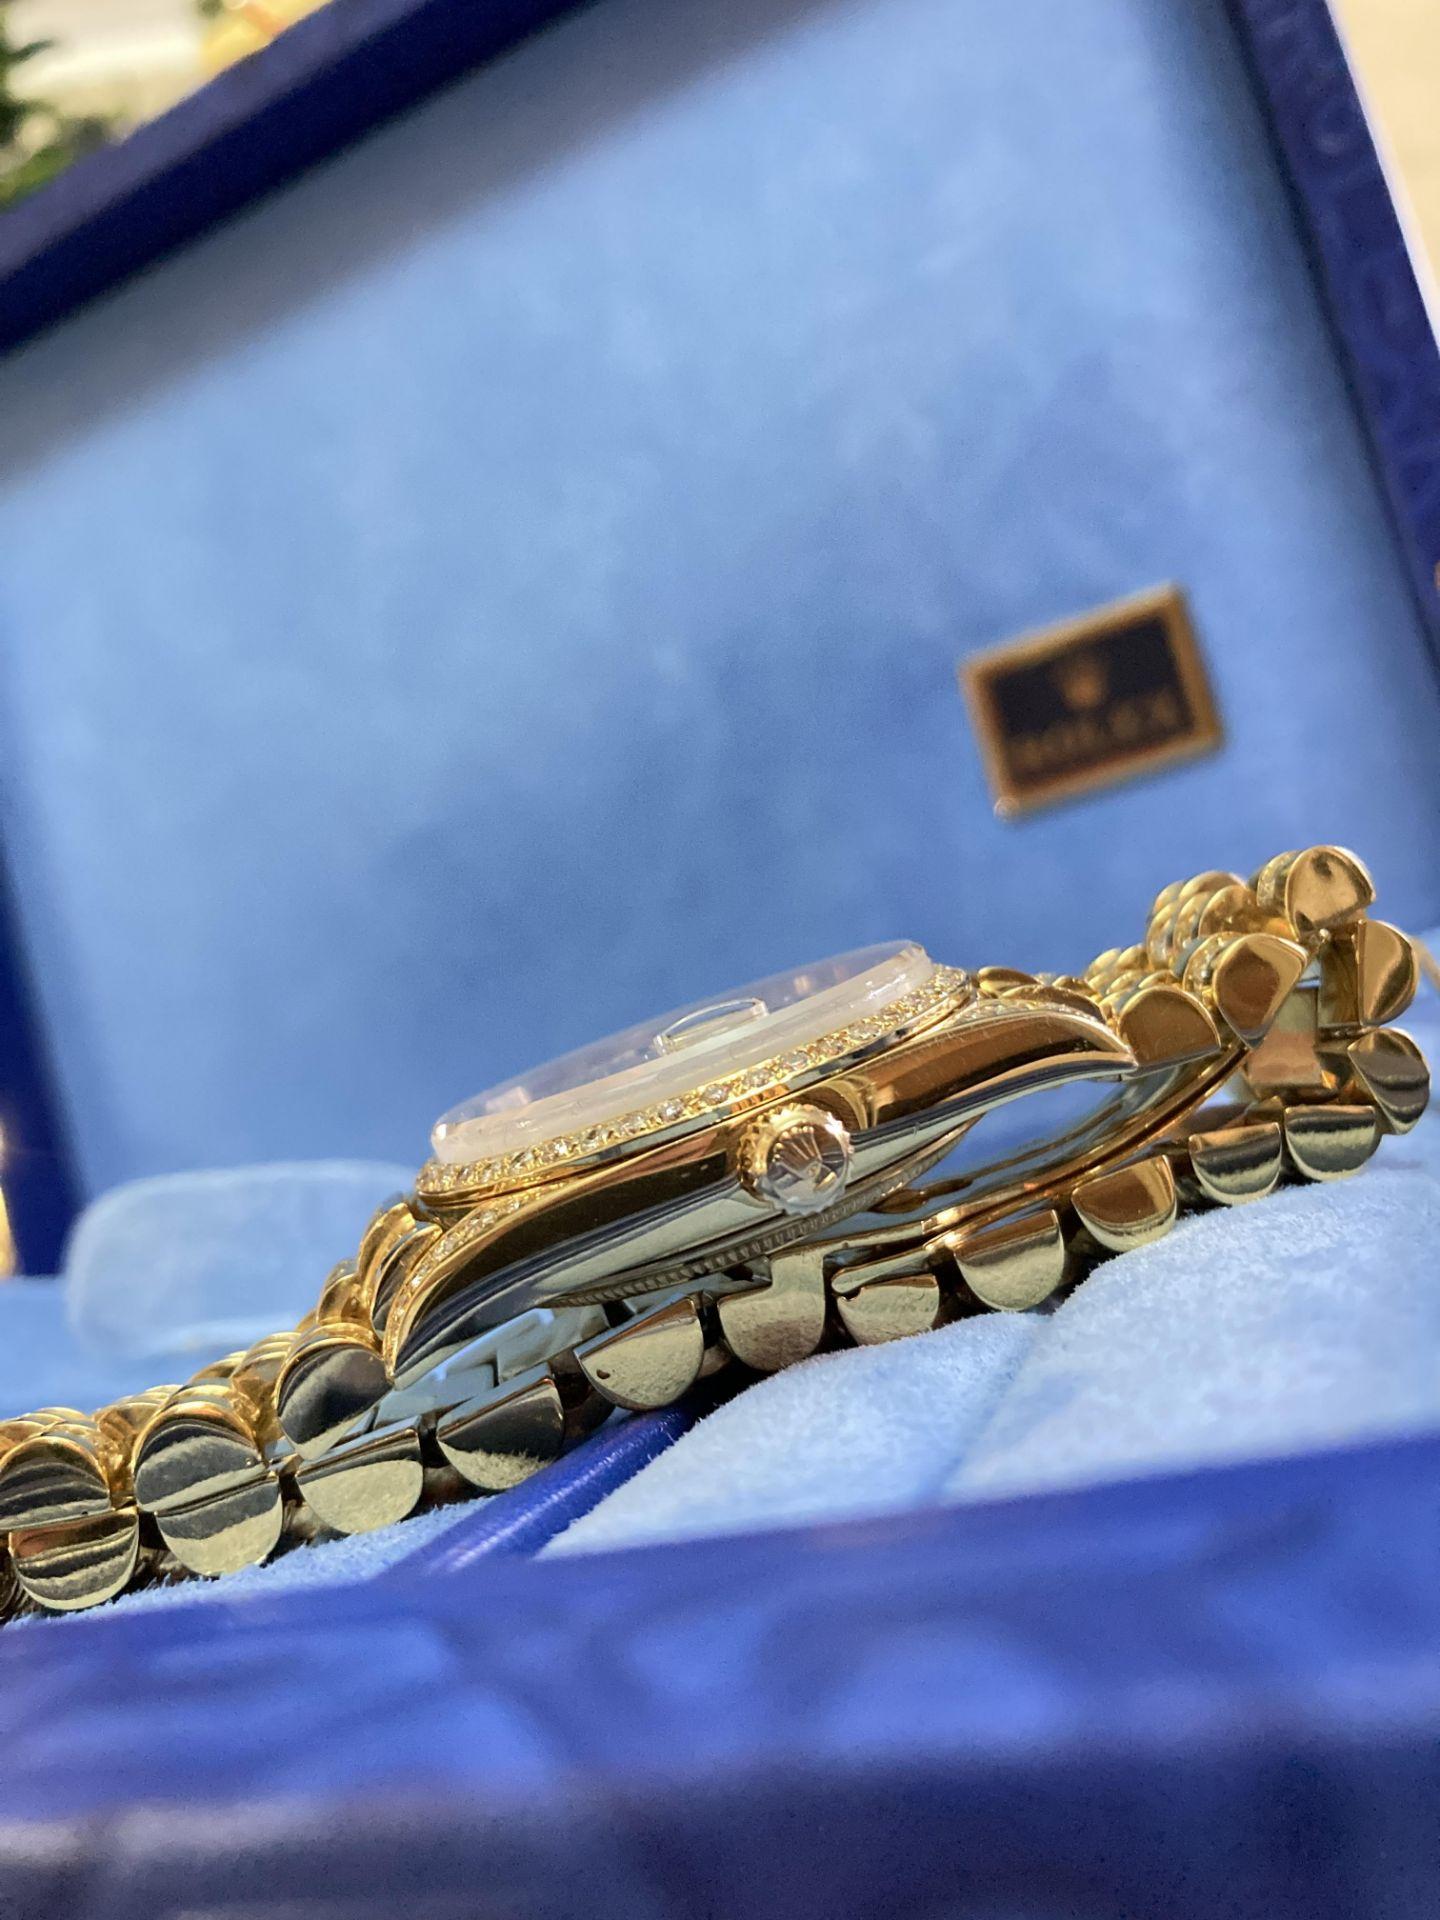 GENTS 36mm ROLEX DAYDATE YELLOW GOLD DIAMOND WATCH - Image 14 of 21